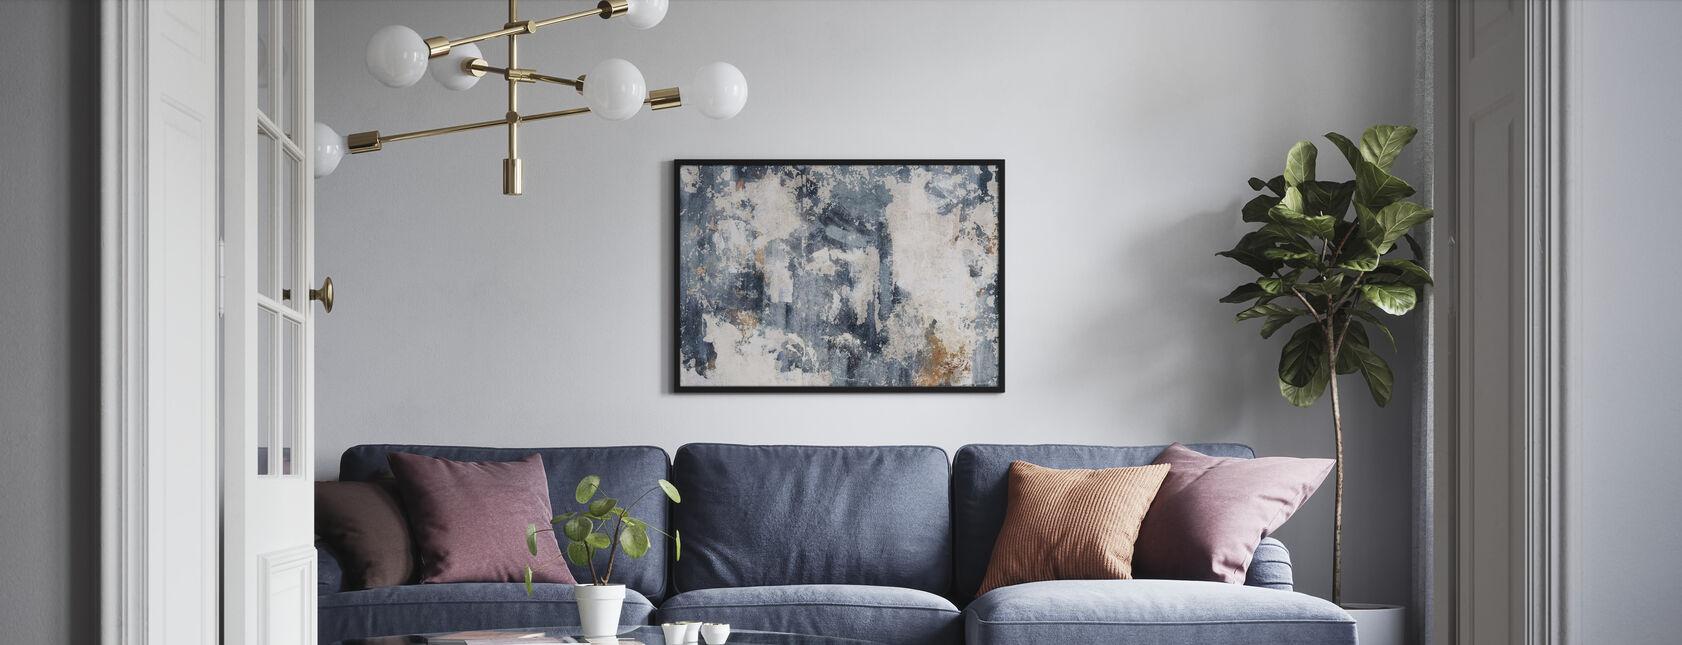 Grunge Wall - Bluish - Poster - Living Room